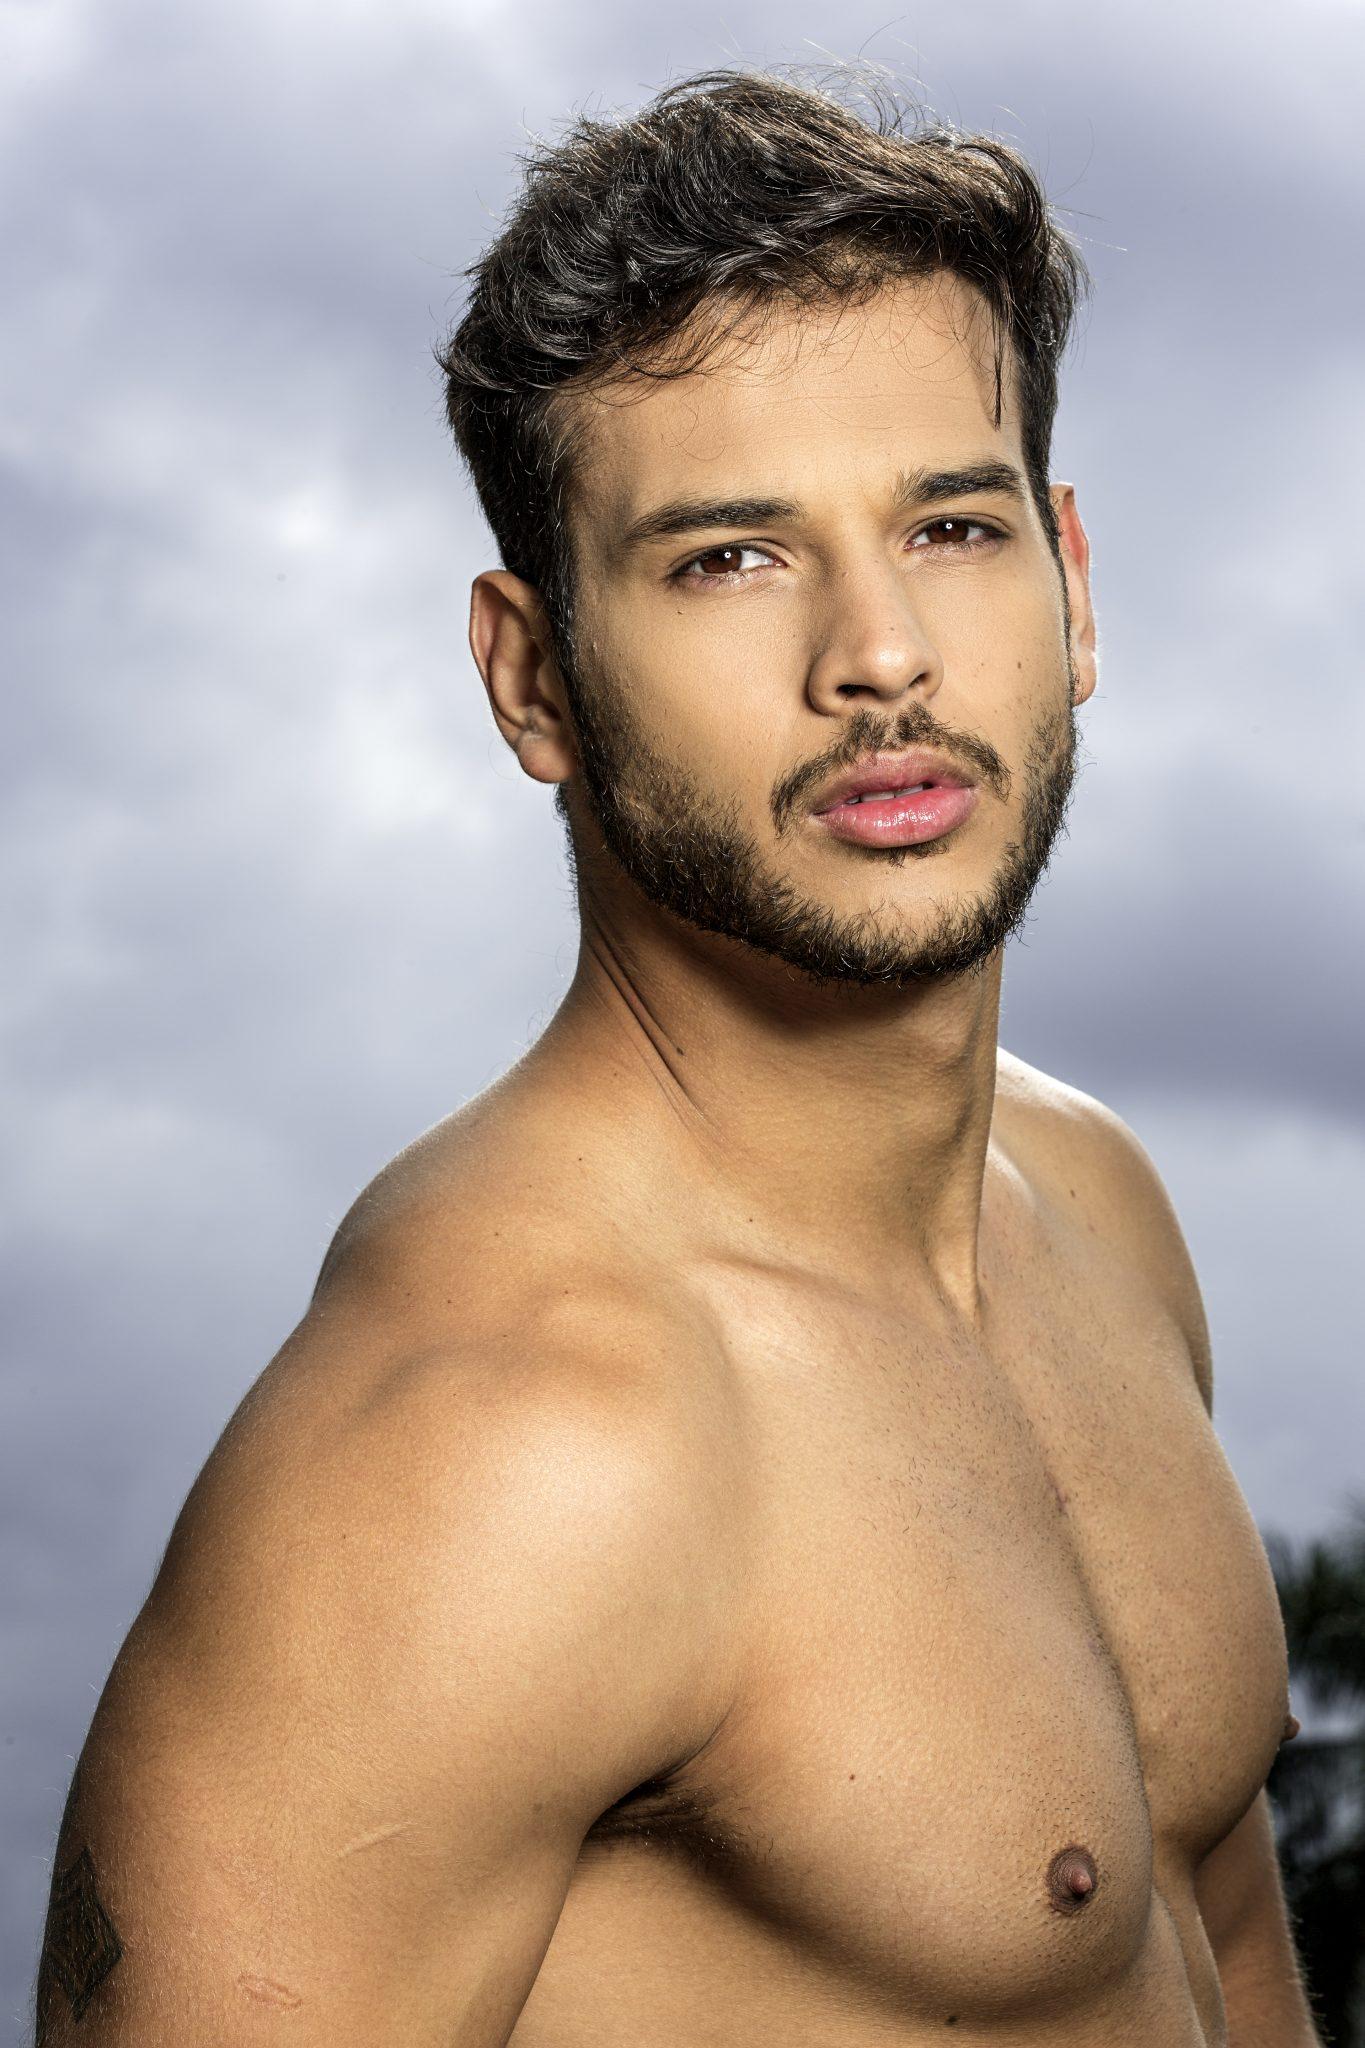 Bruno Rocha and Victor Dos Santos by Ronaldo Gutierrez for Brazilian Male Model